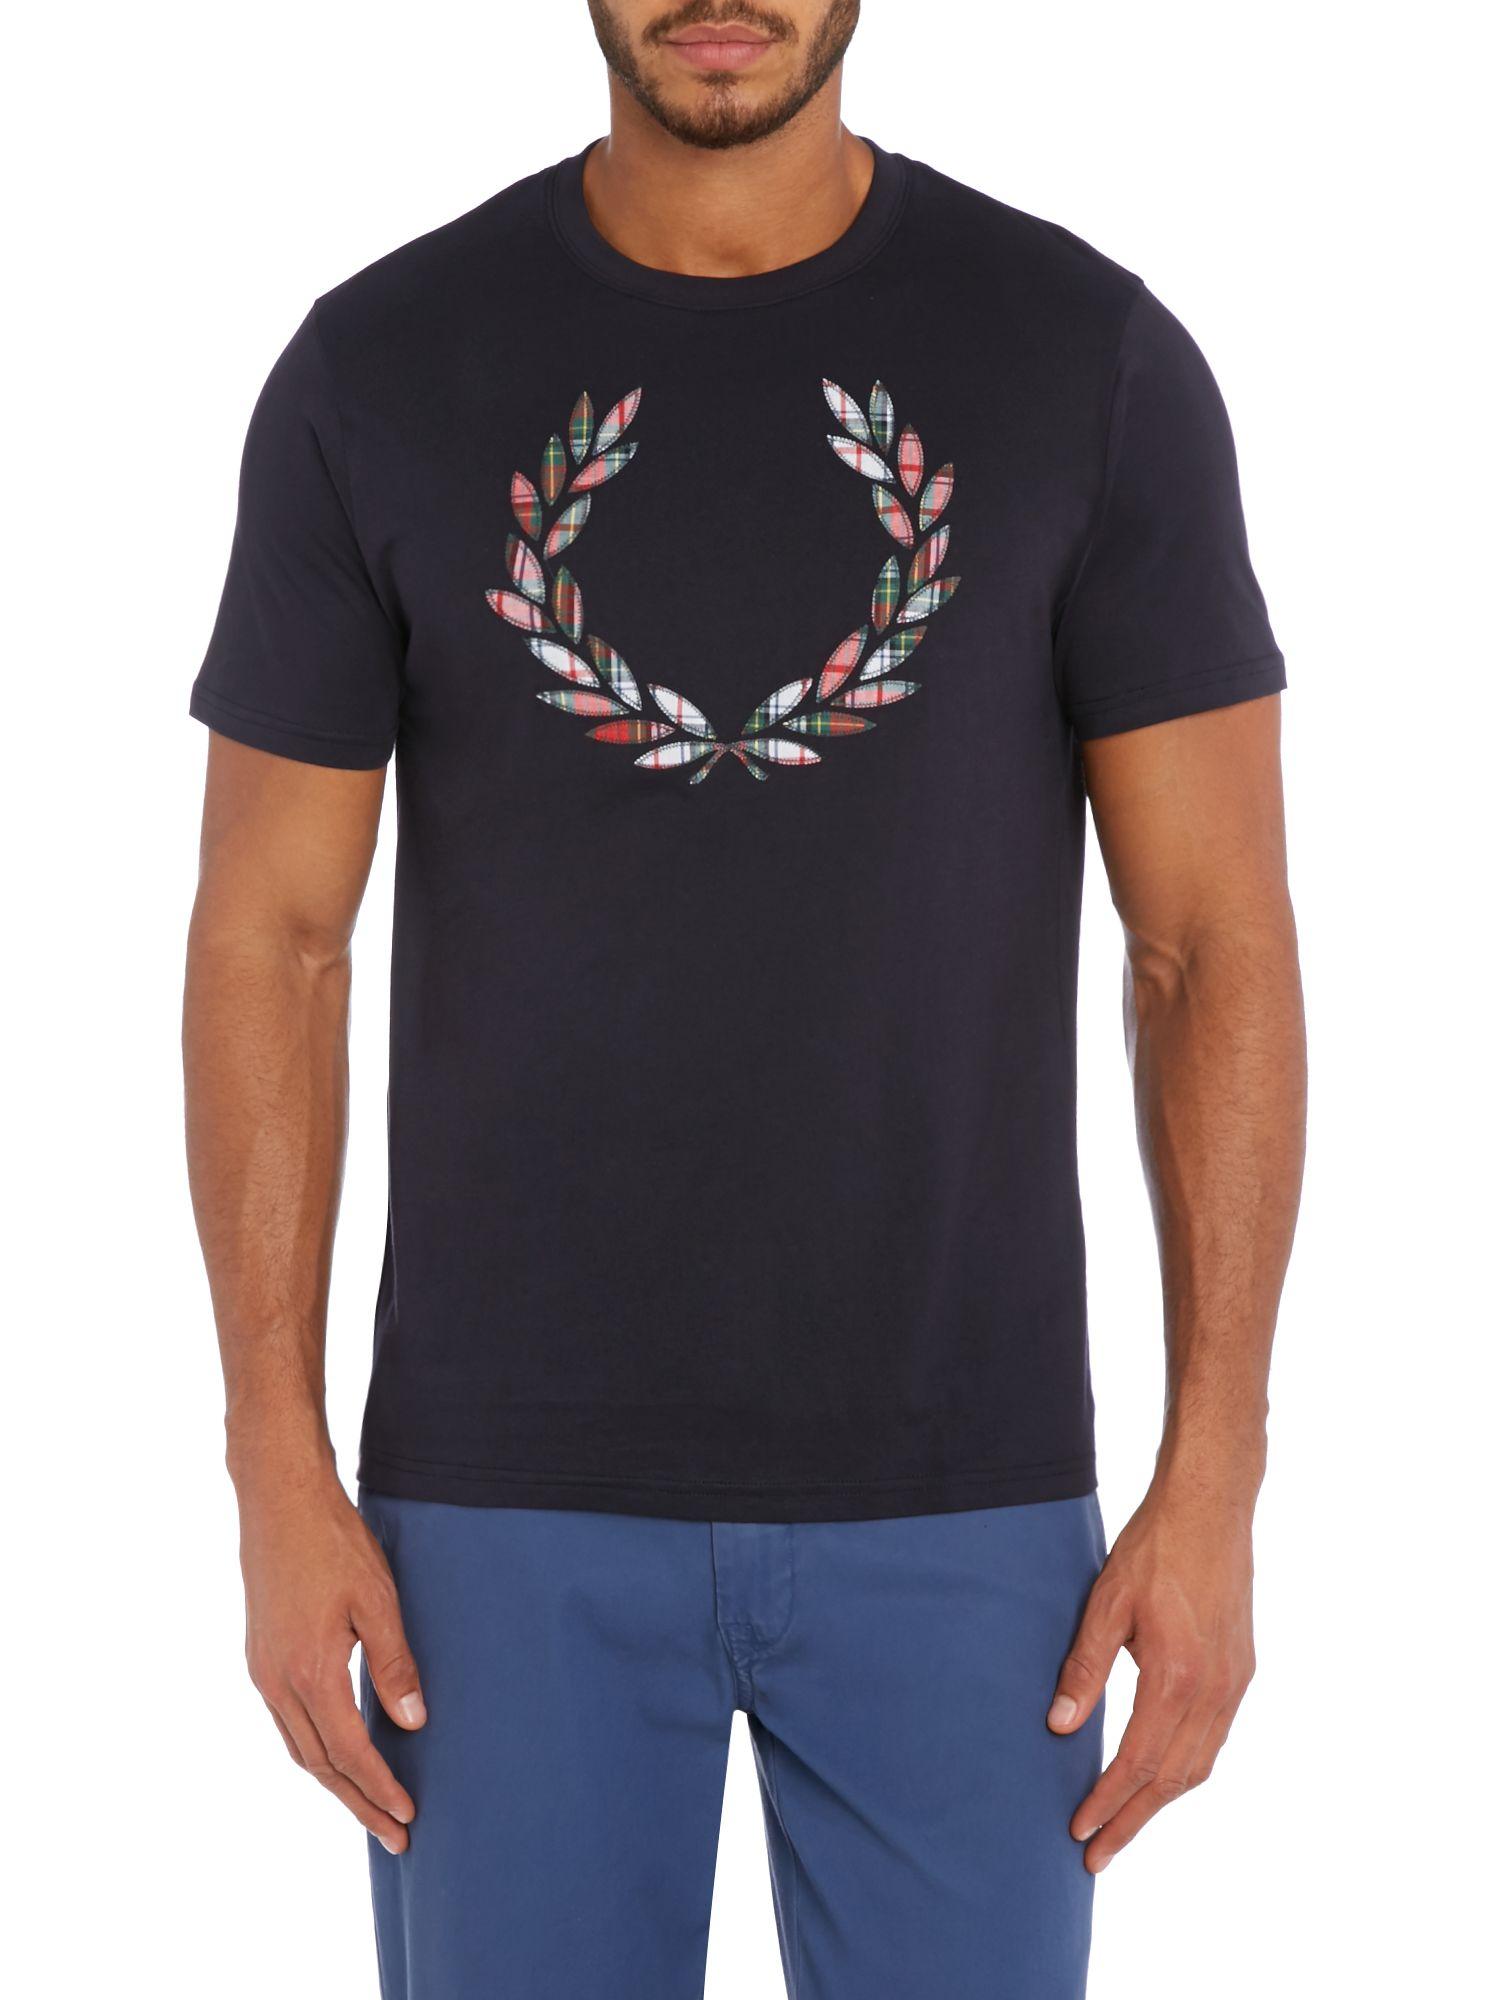 fred perry tartan laurel wreath short sleeve t shirt in blue for men. Black Bedroom Furniture Sets. Home Design Ideas